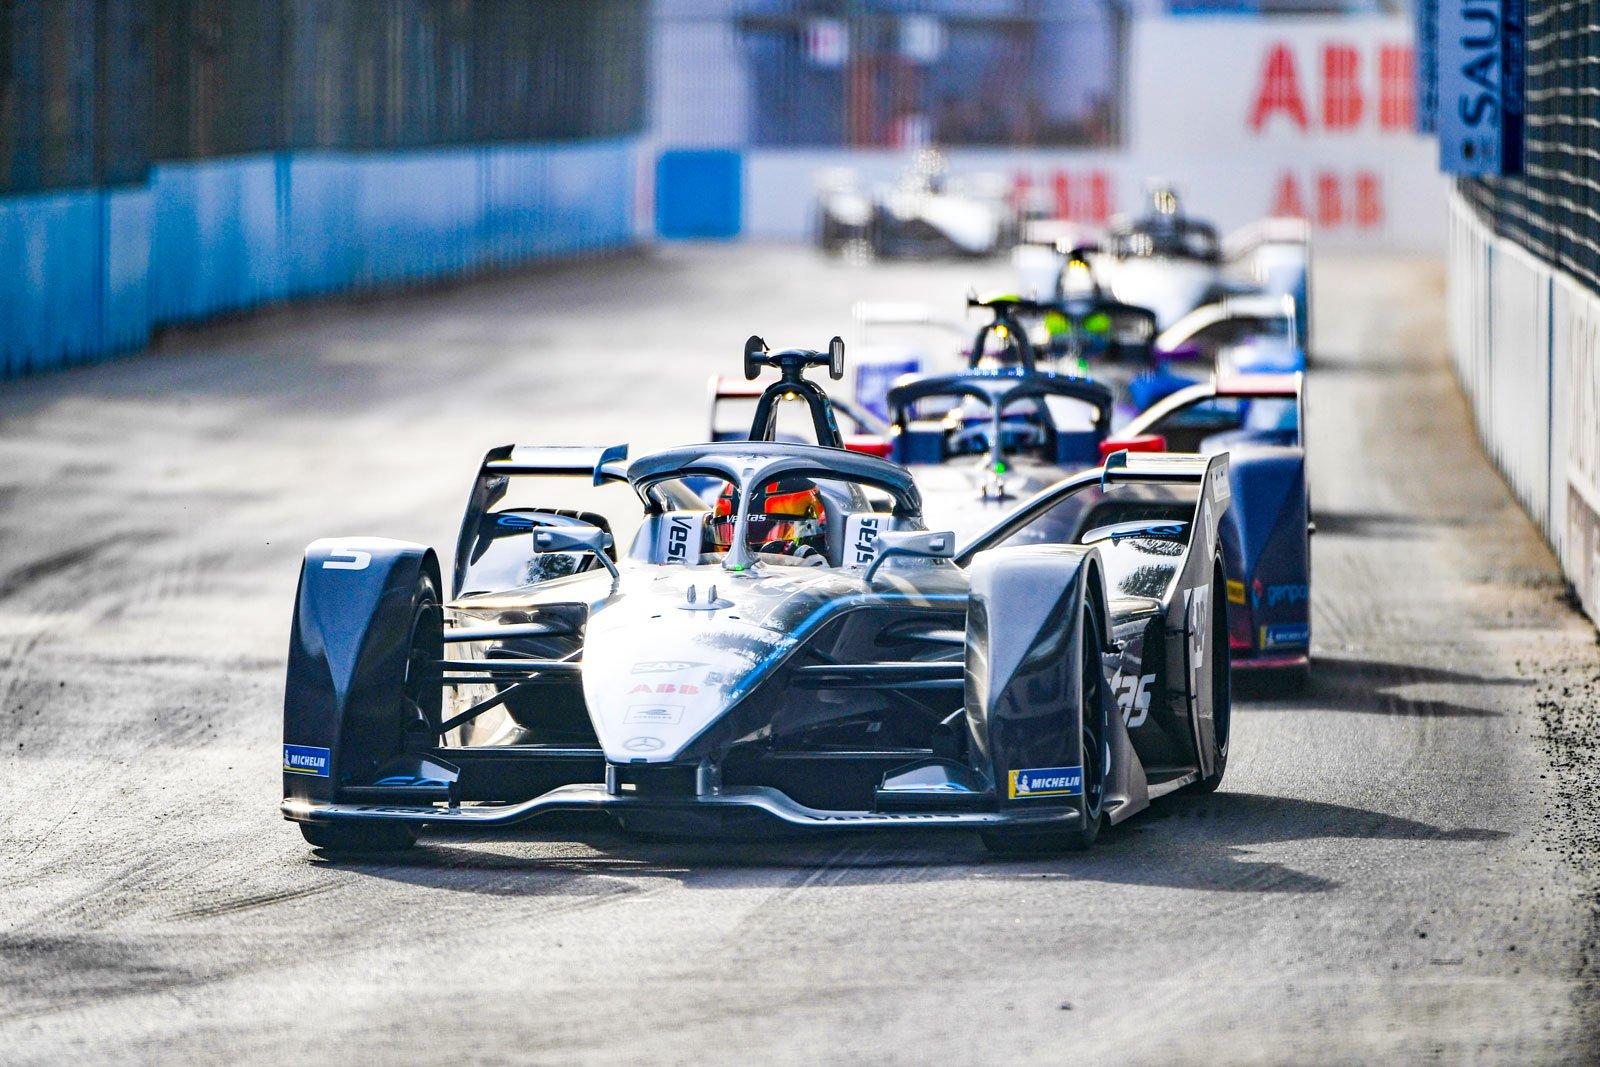 Formula E - Mercedes-Benz EQ Formula E Team, Diriyah E-Prix 2019. Stoffel Vandoorne